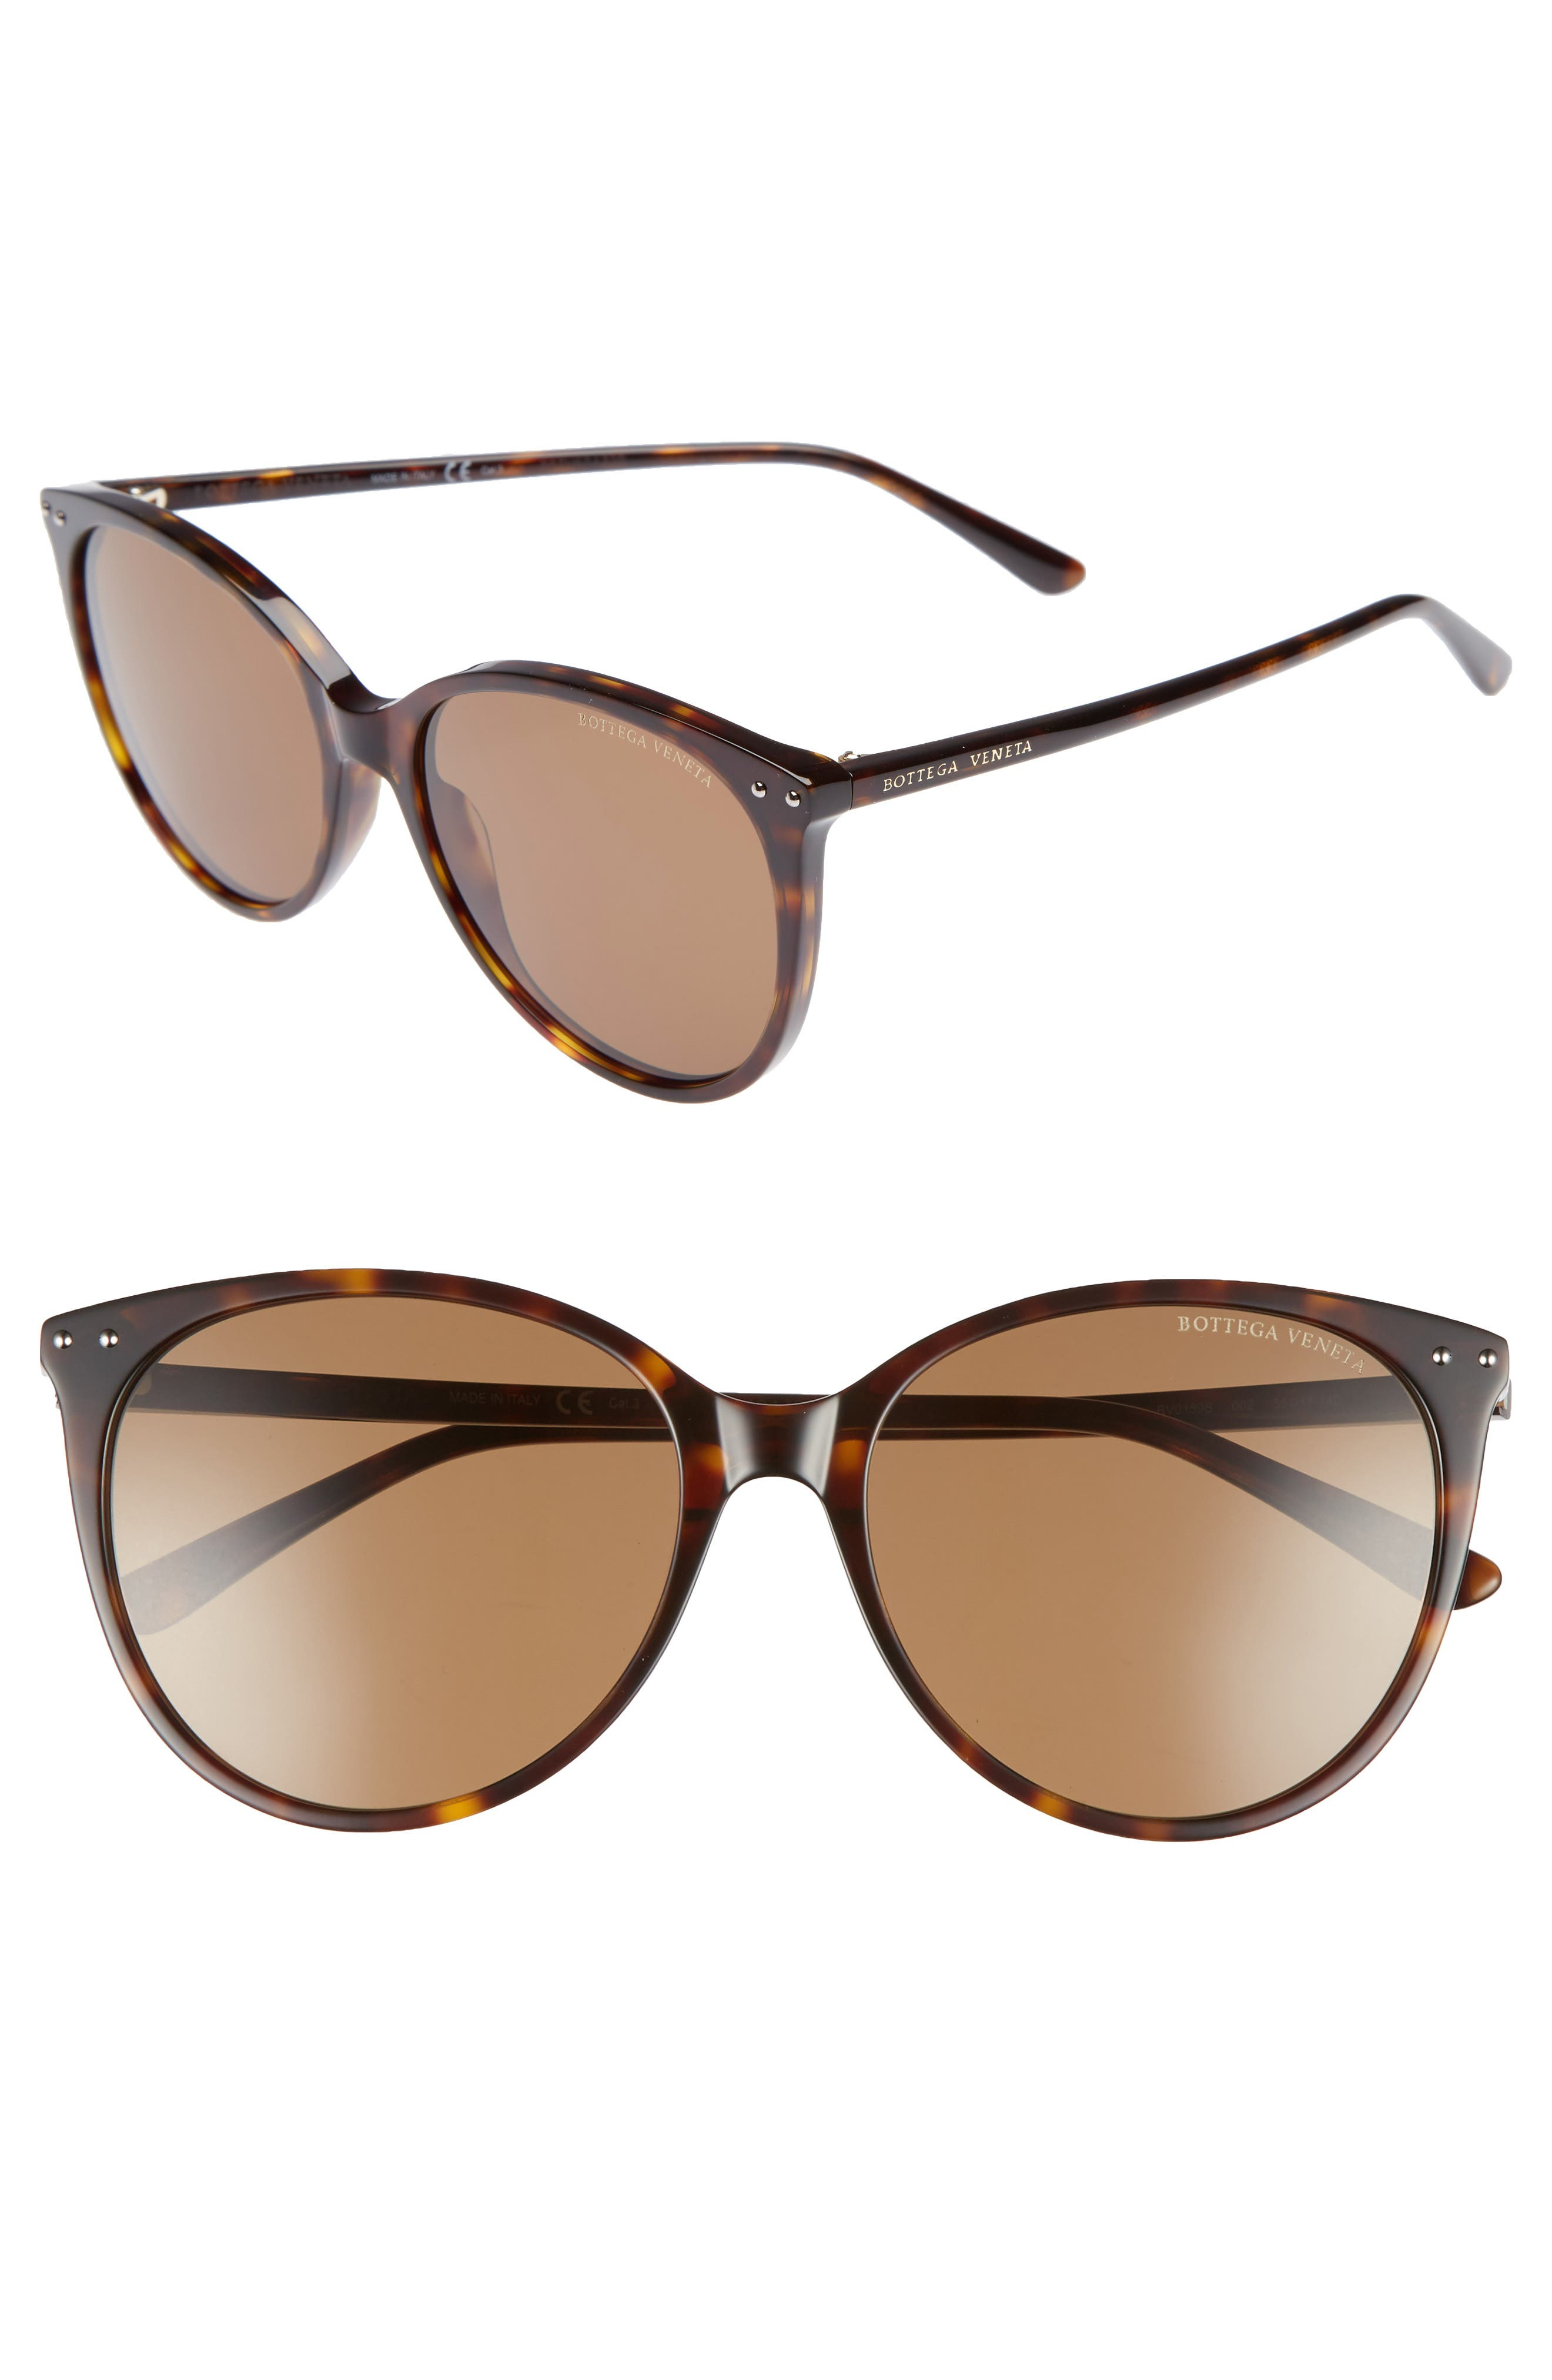 55mm Cat Eye Sunglasses,                         Main,                         color, DARK HAVANA